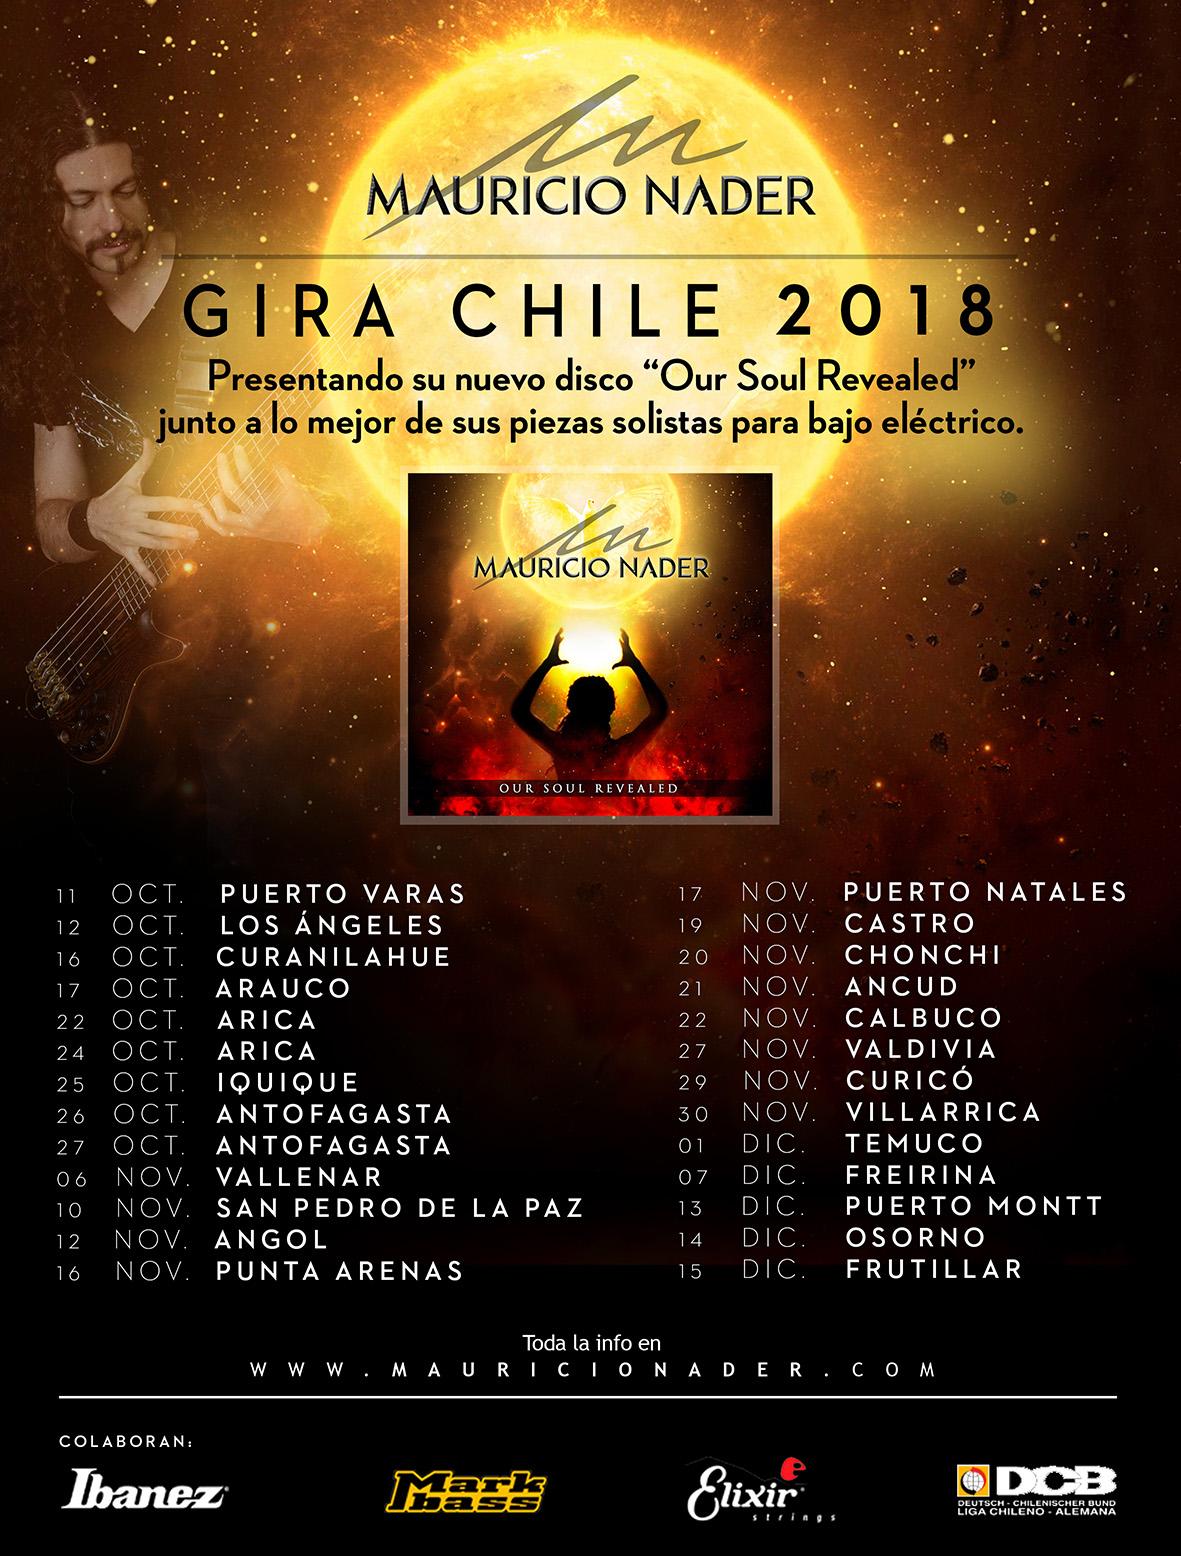 Gira Chile 2018